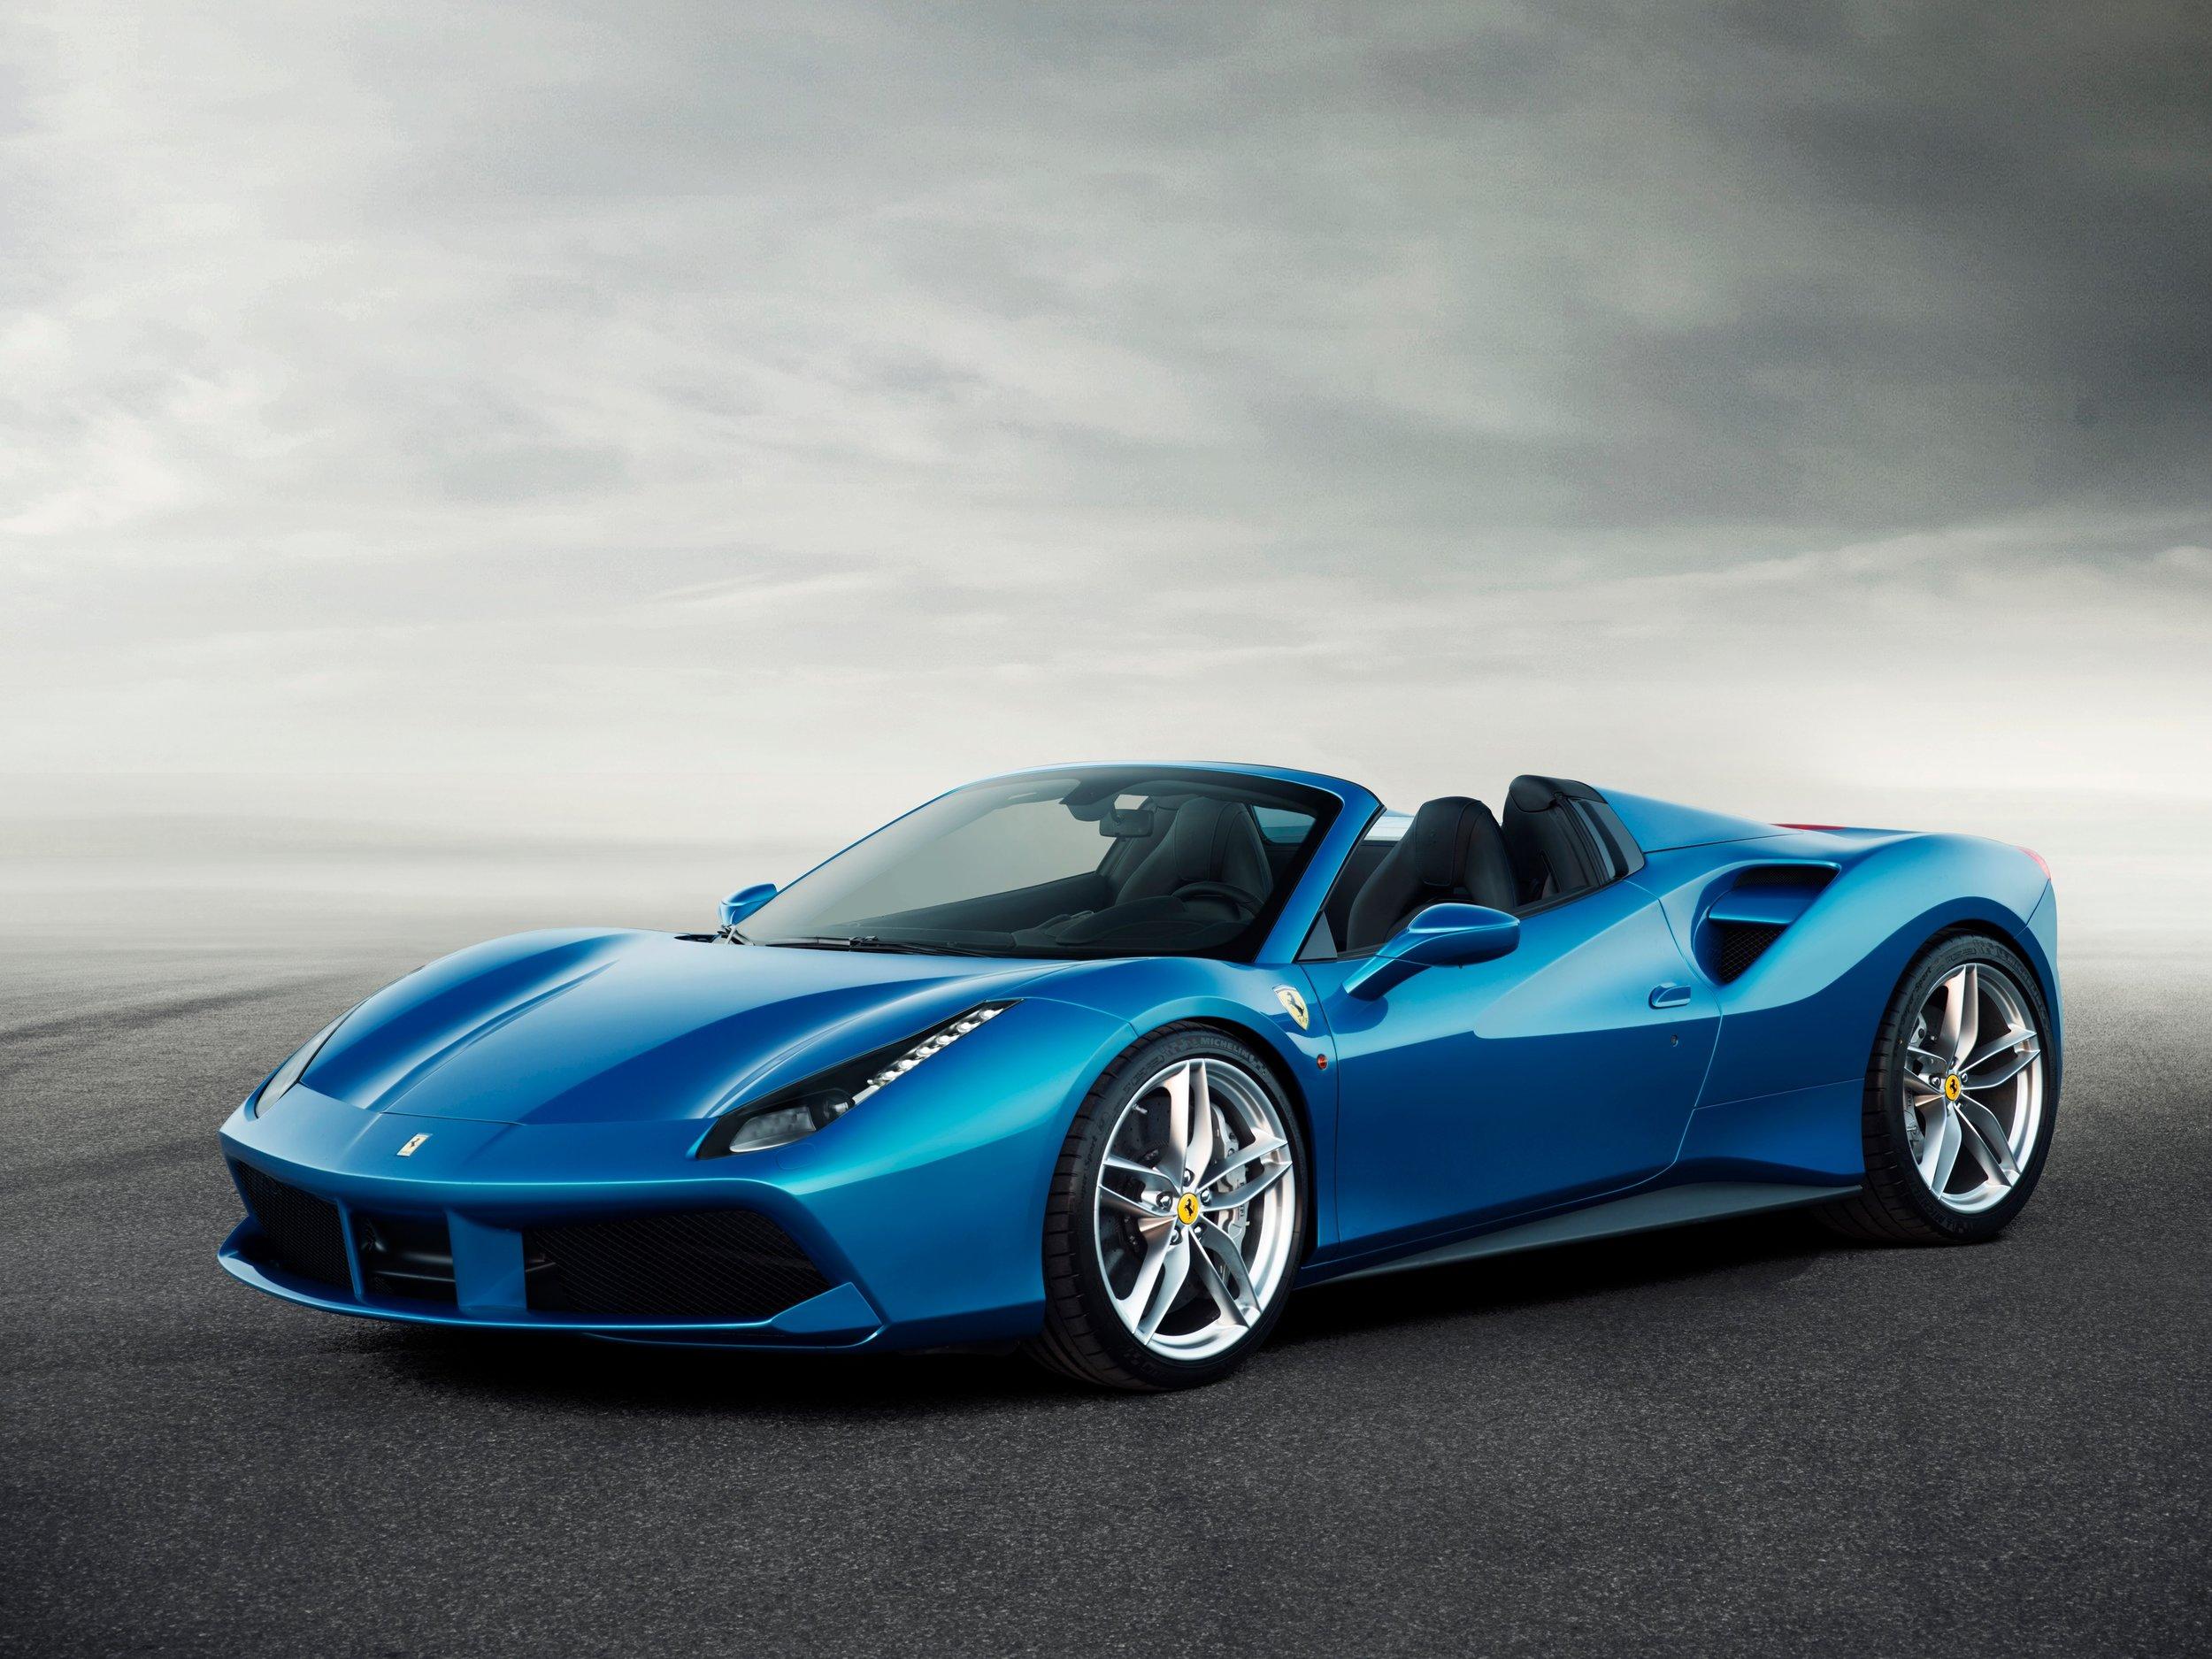 ferrari-reveals-the-convertible-version-of-its-new-488-supercar.jpg